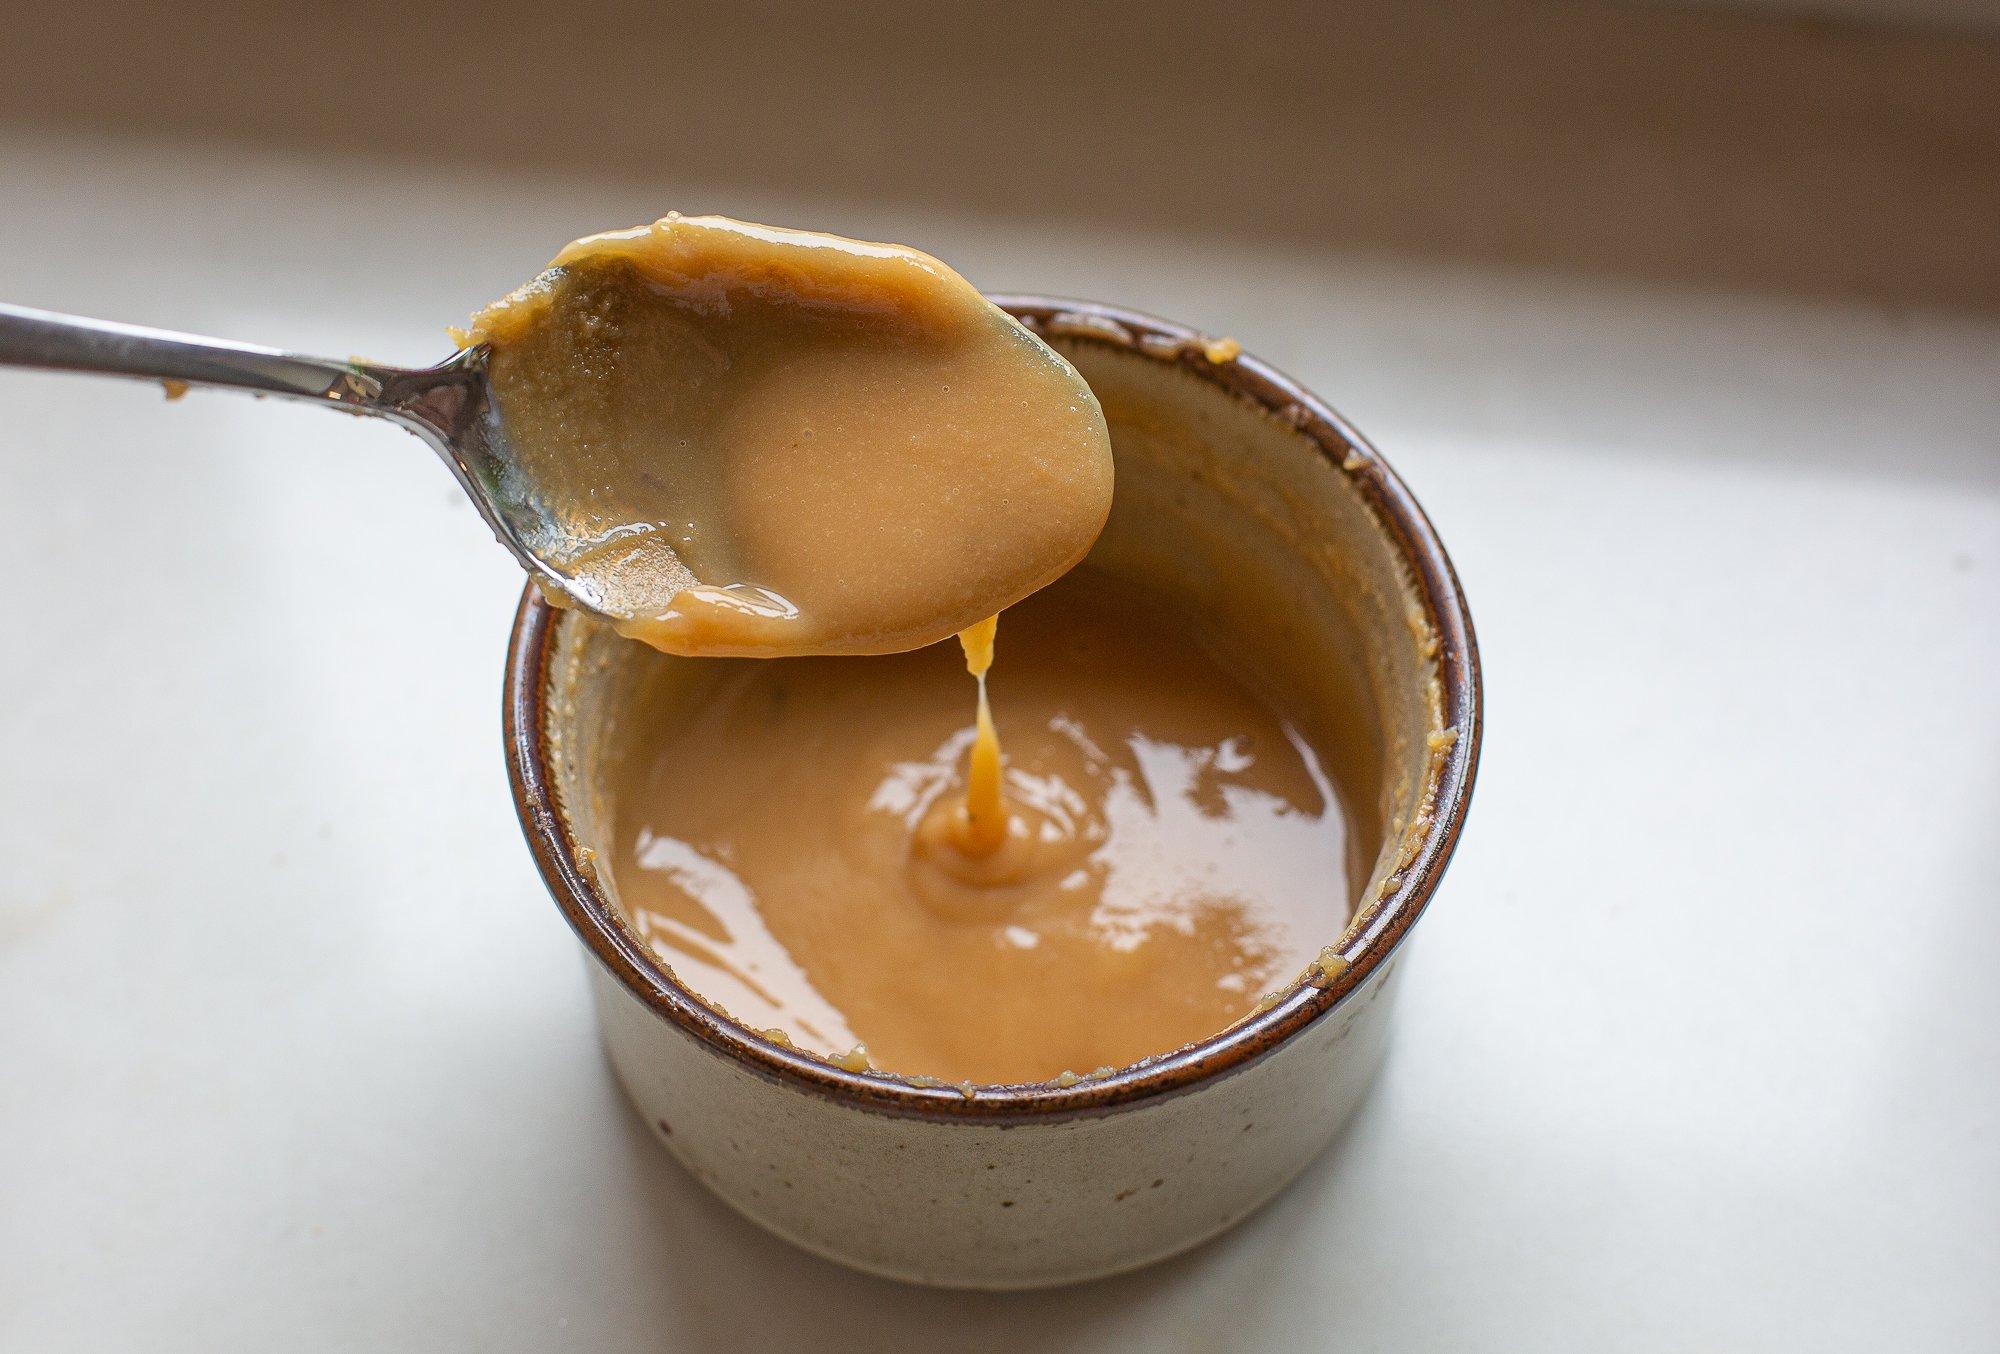 caramel sauce in a bowl